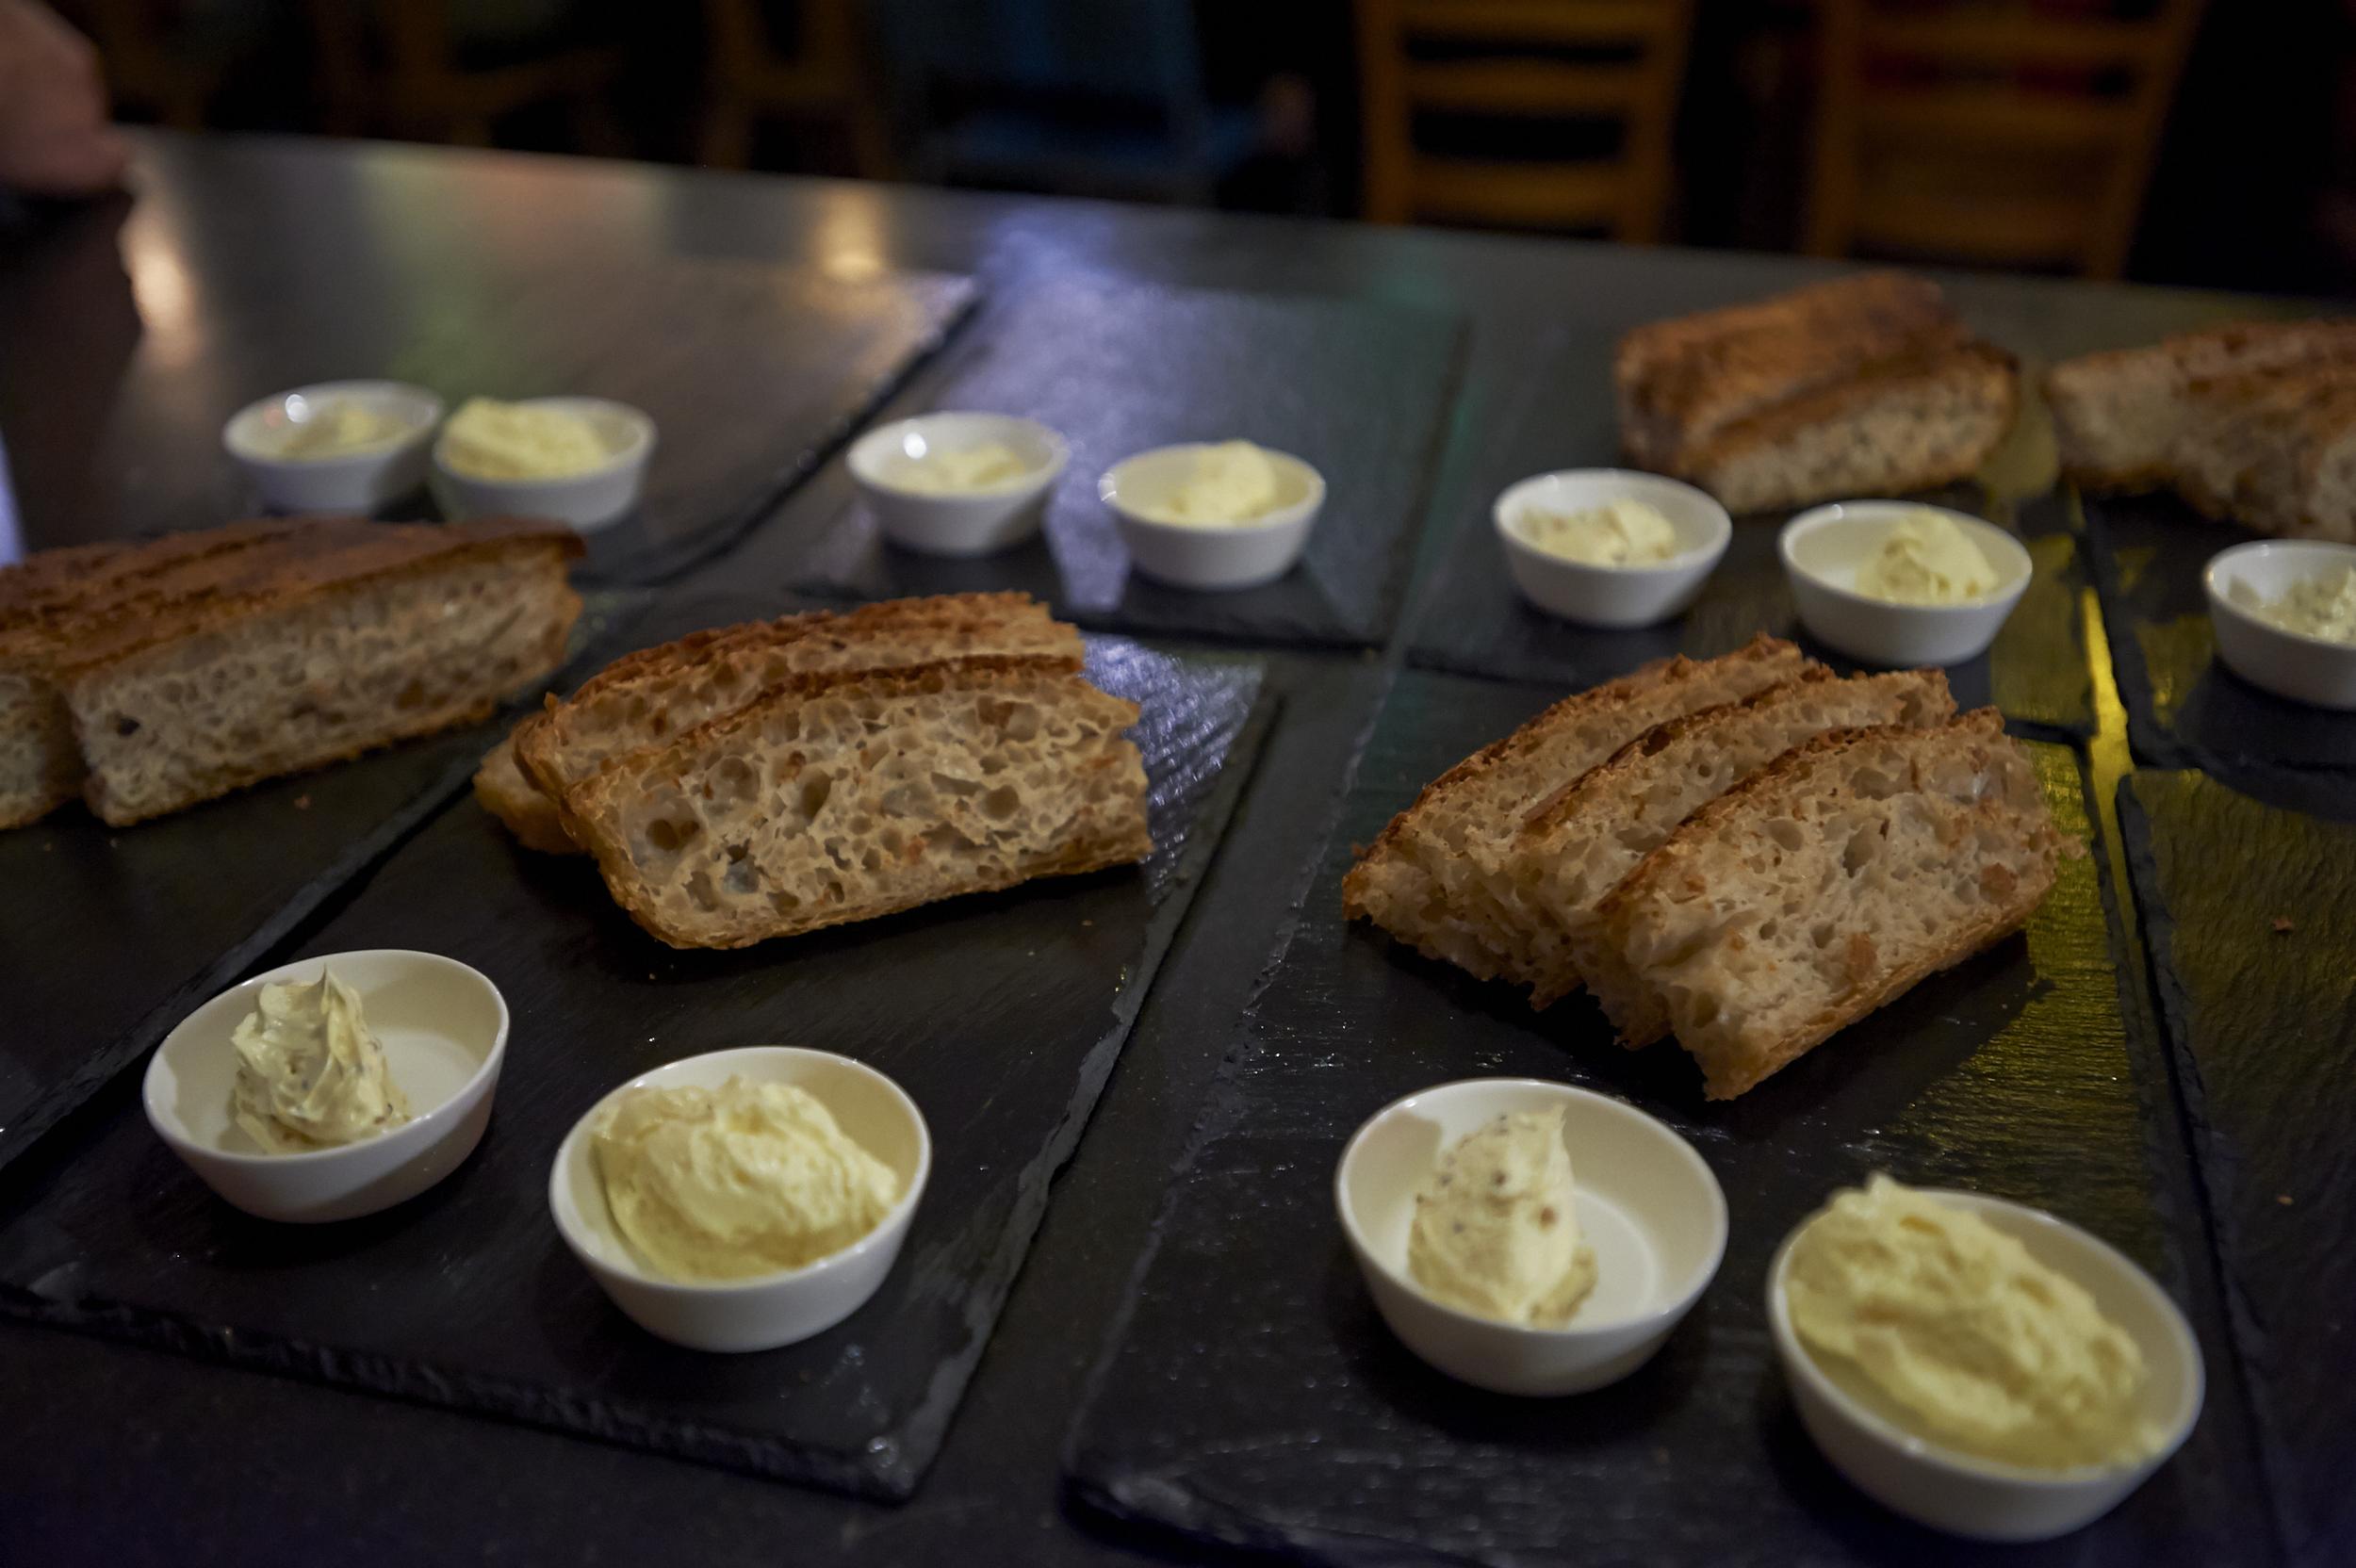 Sourdough bread with local Mühlerama flour, homemade bone marrow and mustard butter